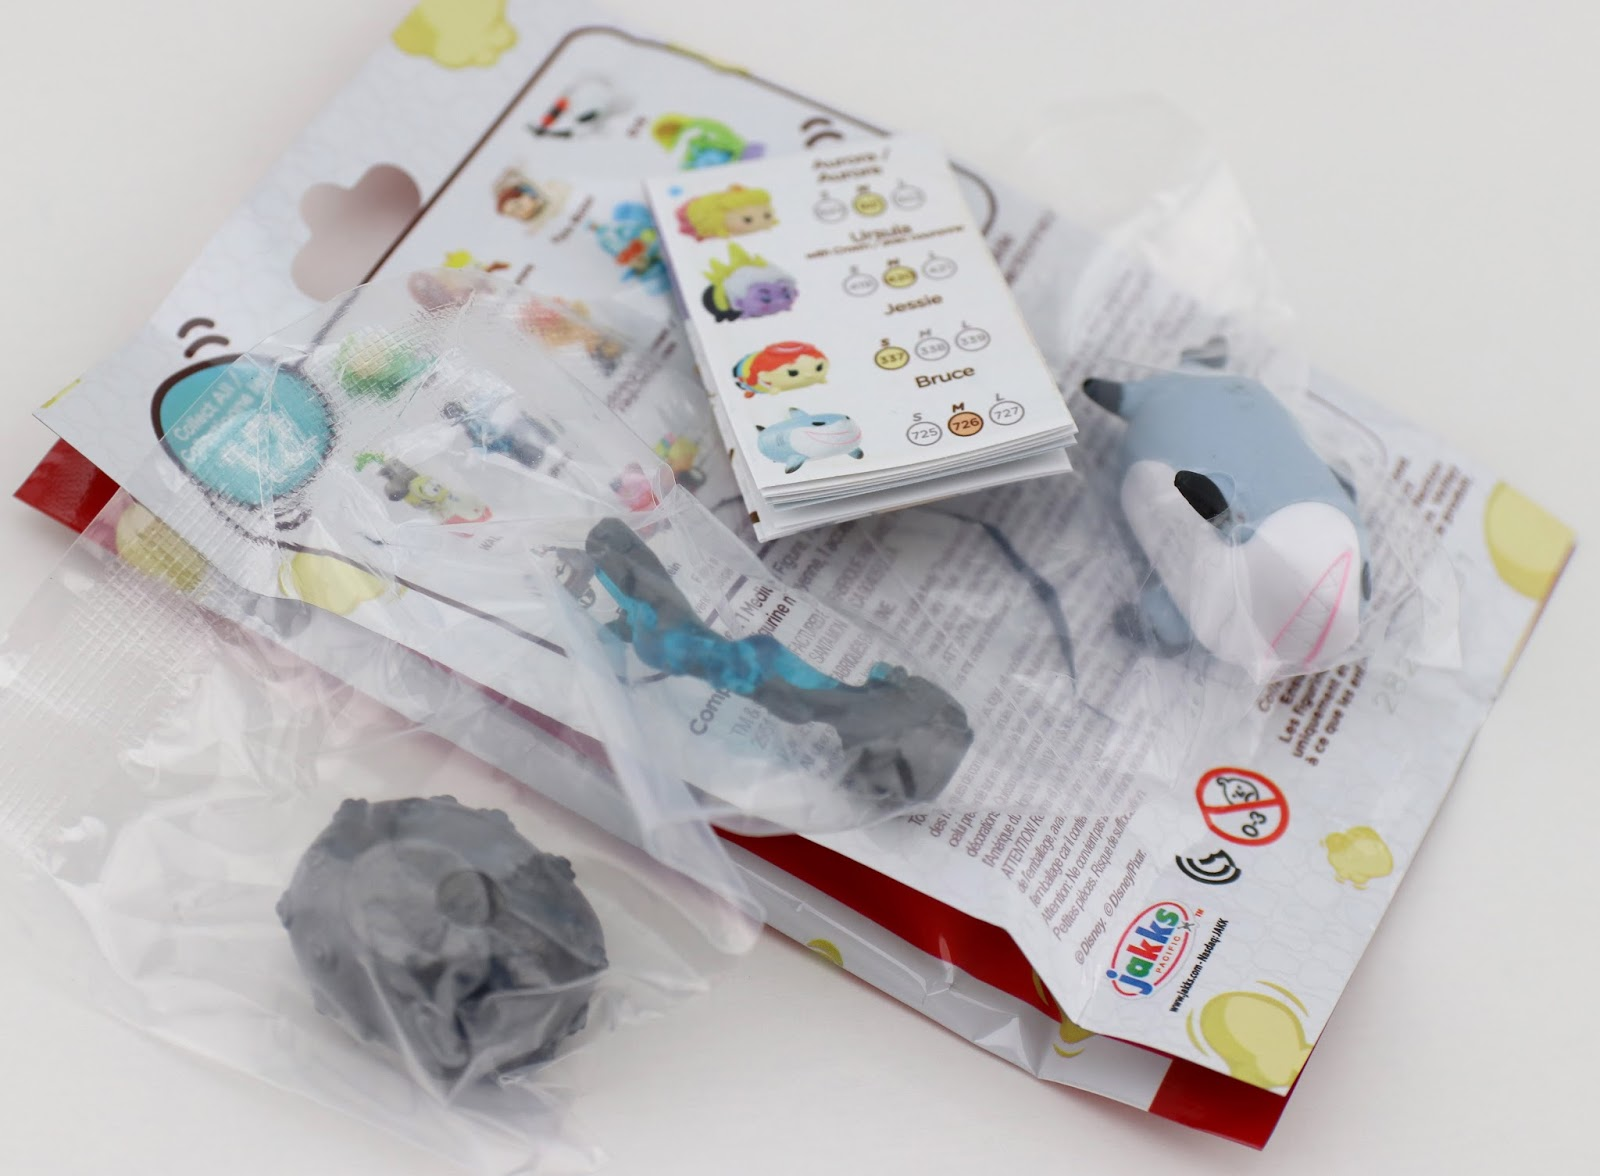 Disney Tsum Tsum Mystery Packs by Jakks Pacific Series 9 Pixar bruce